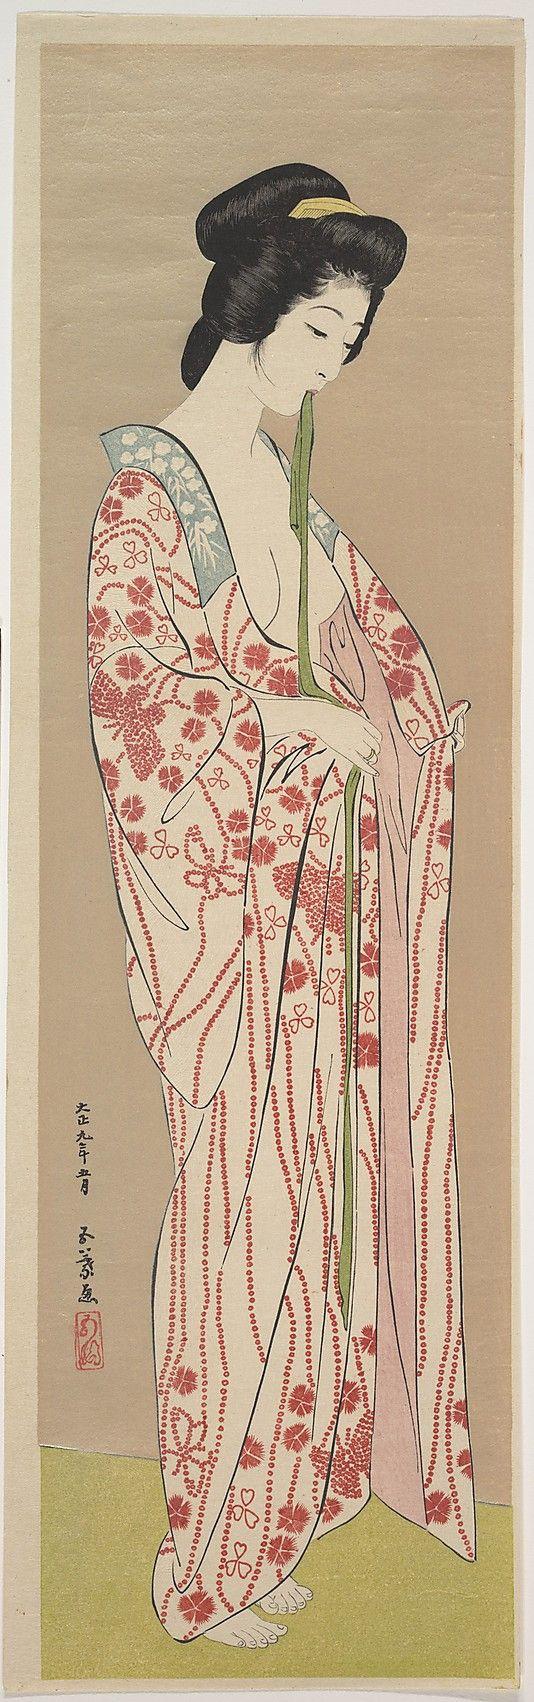 Woman Dressing, by artistHashiguchi Goyô, circa 1920, Japan. Ukiyo-ePolychrome woodblock print; ink and color on paper